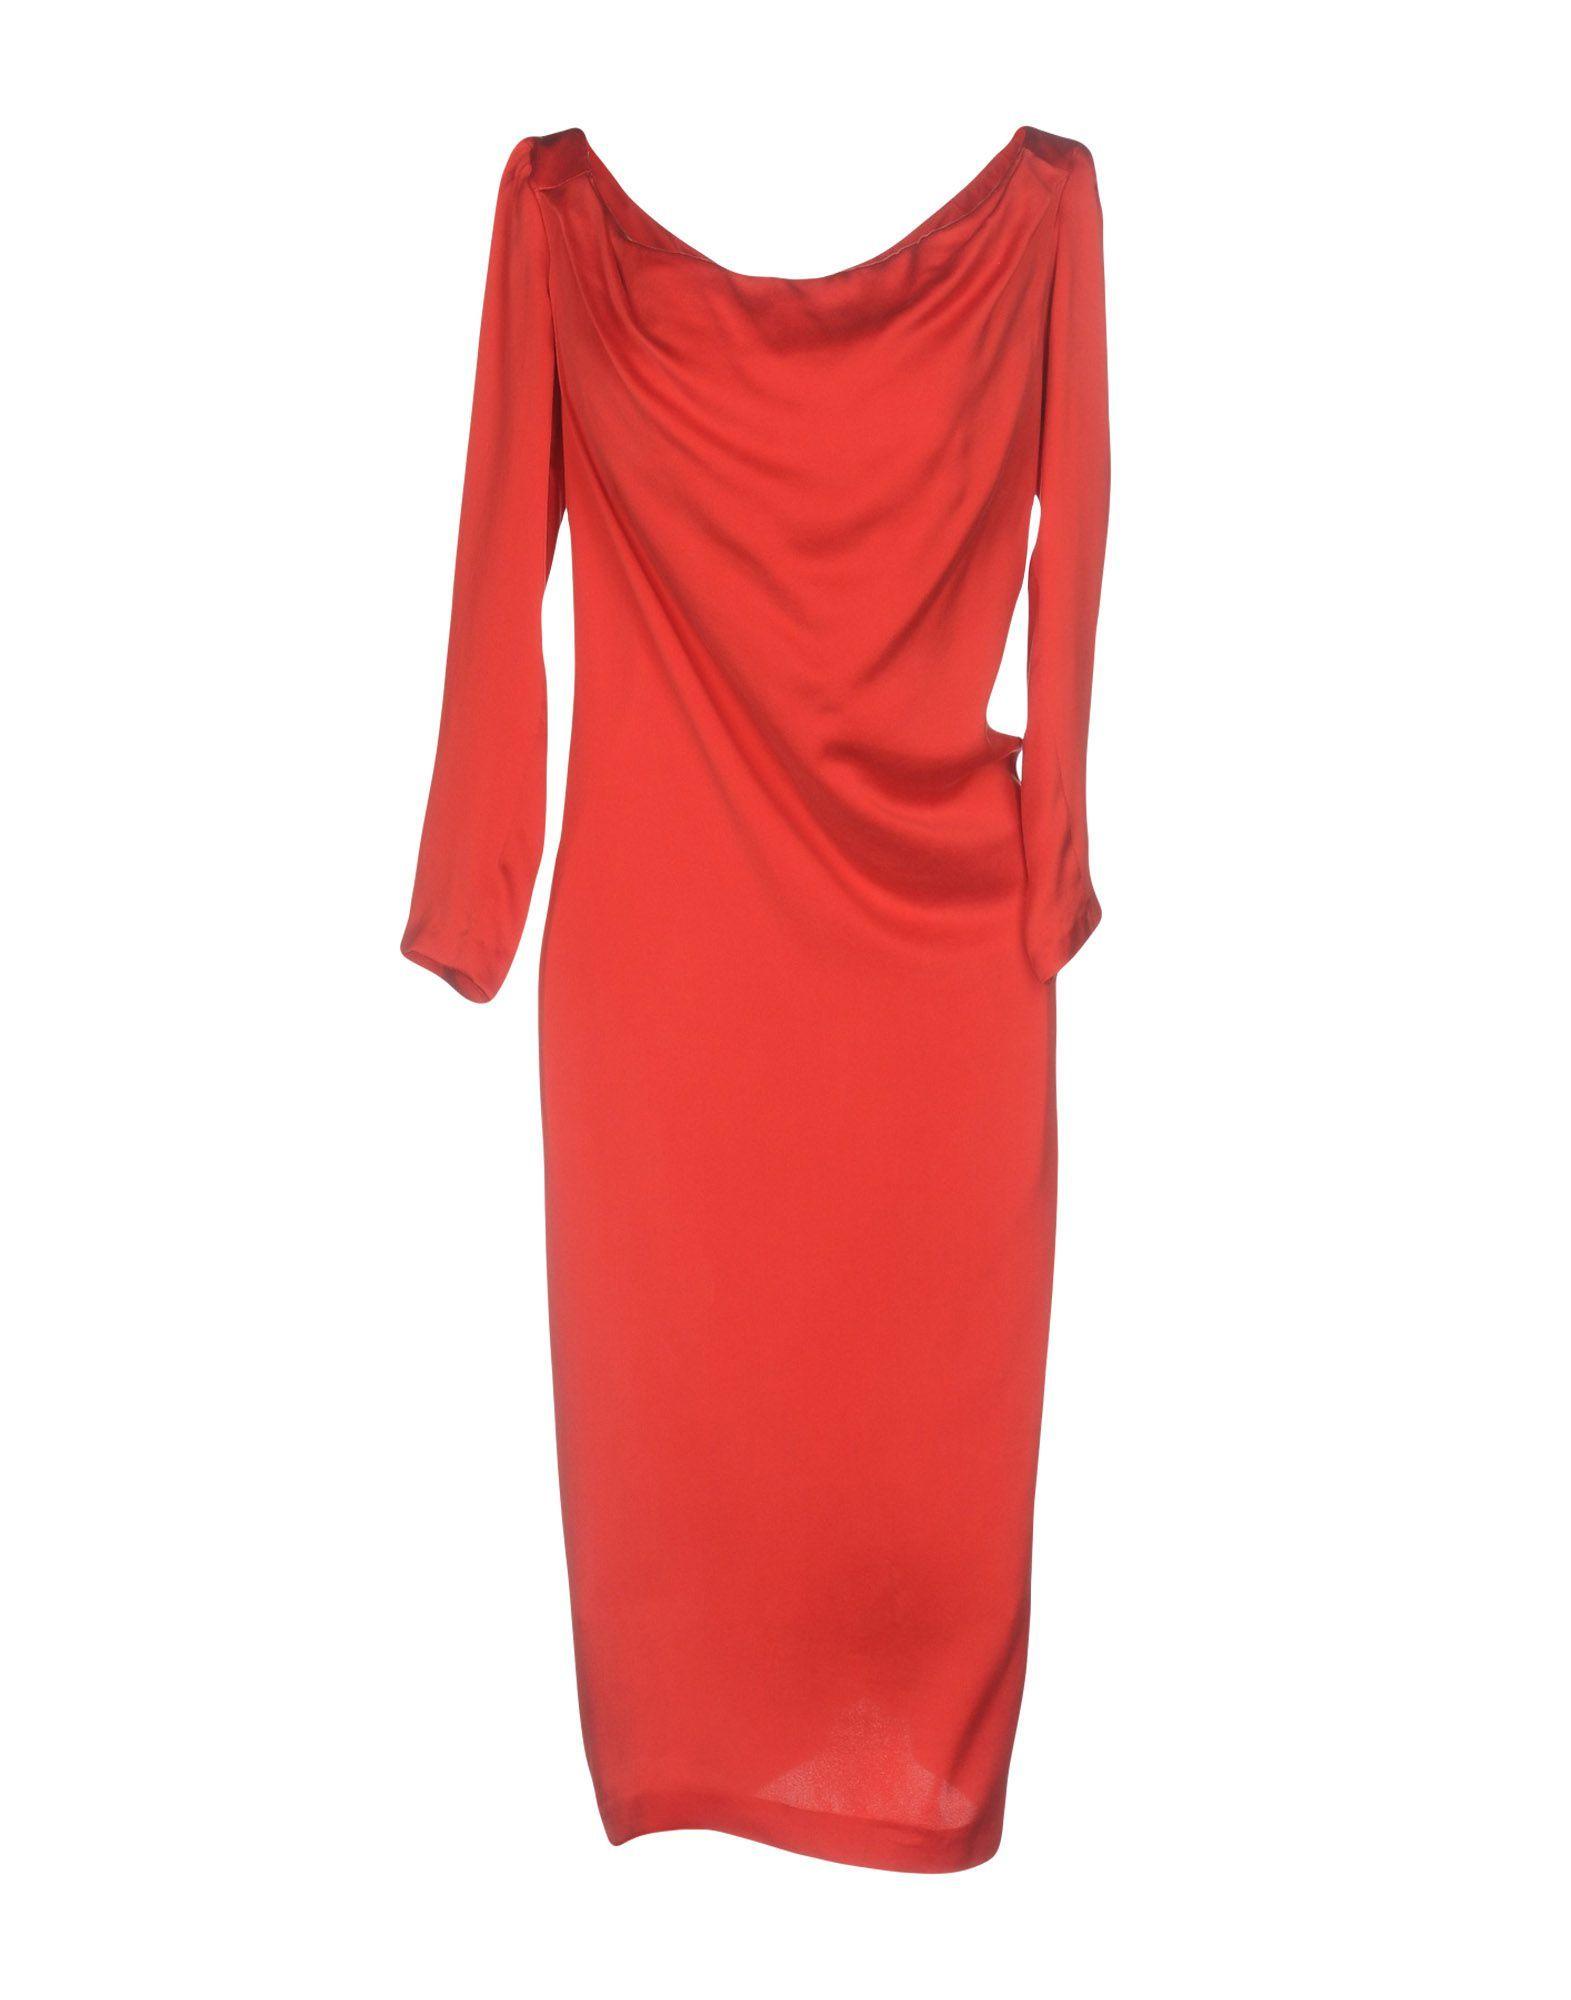 DRESSES - Knee-length dresses Blumarine zIW2p9Fx2d